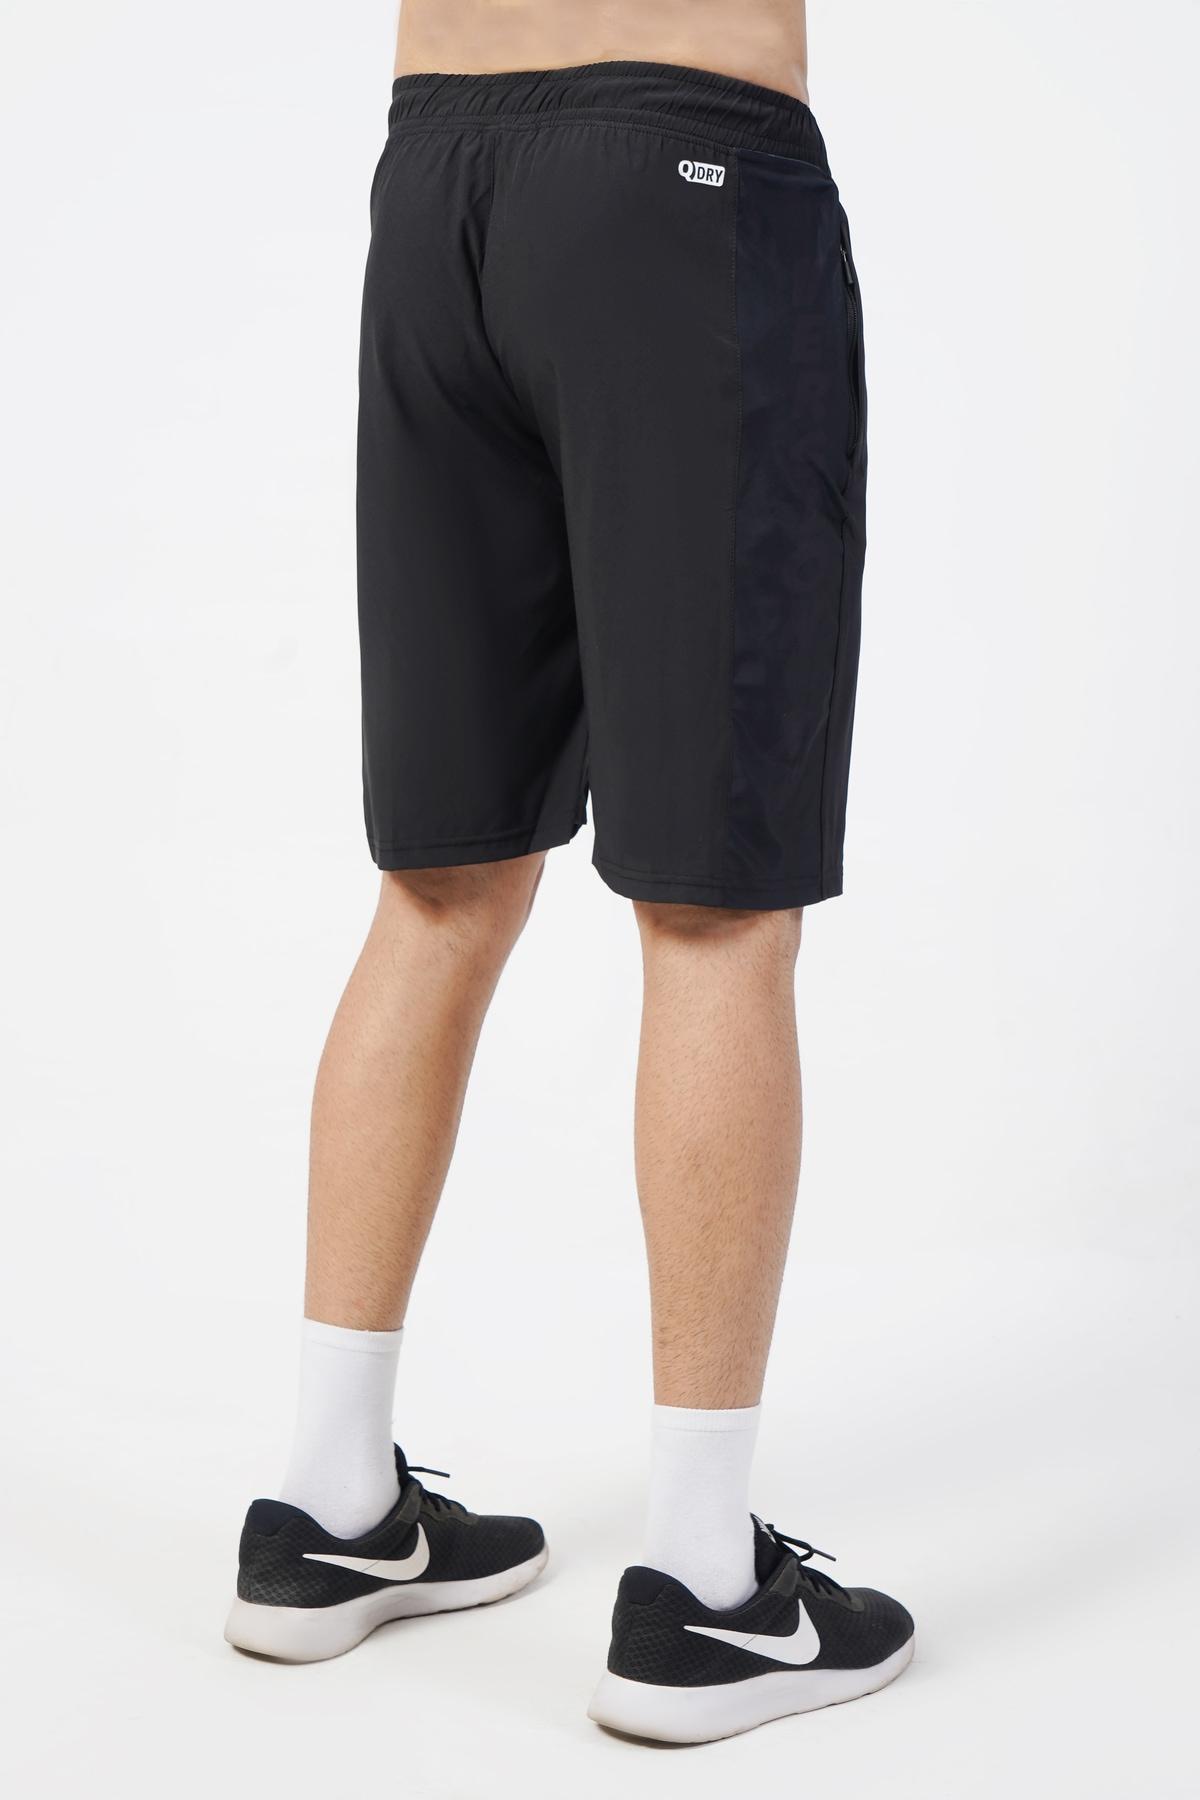 Power-Up Black Shorts